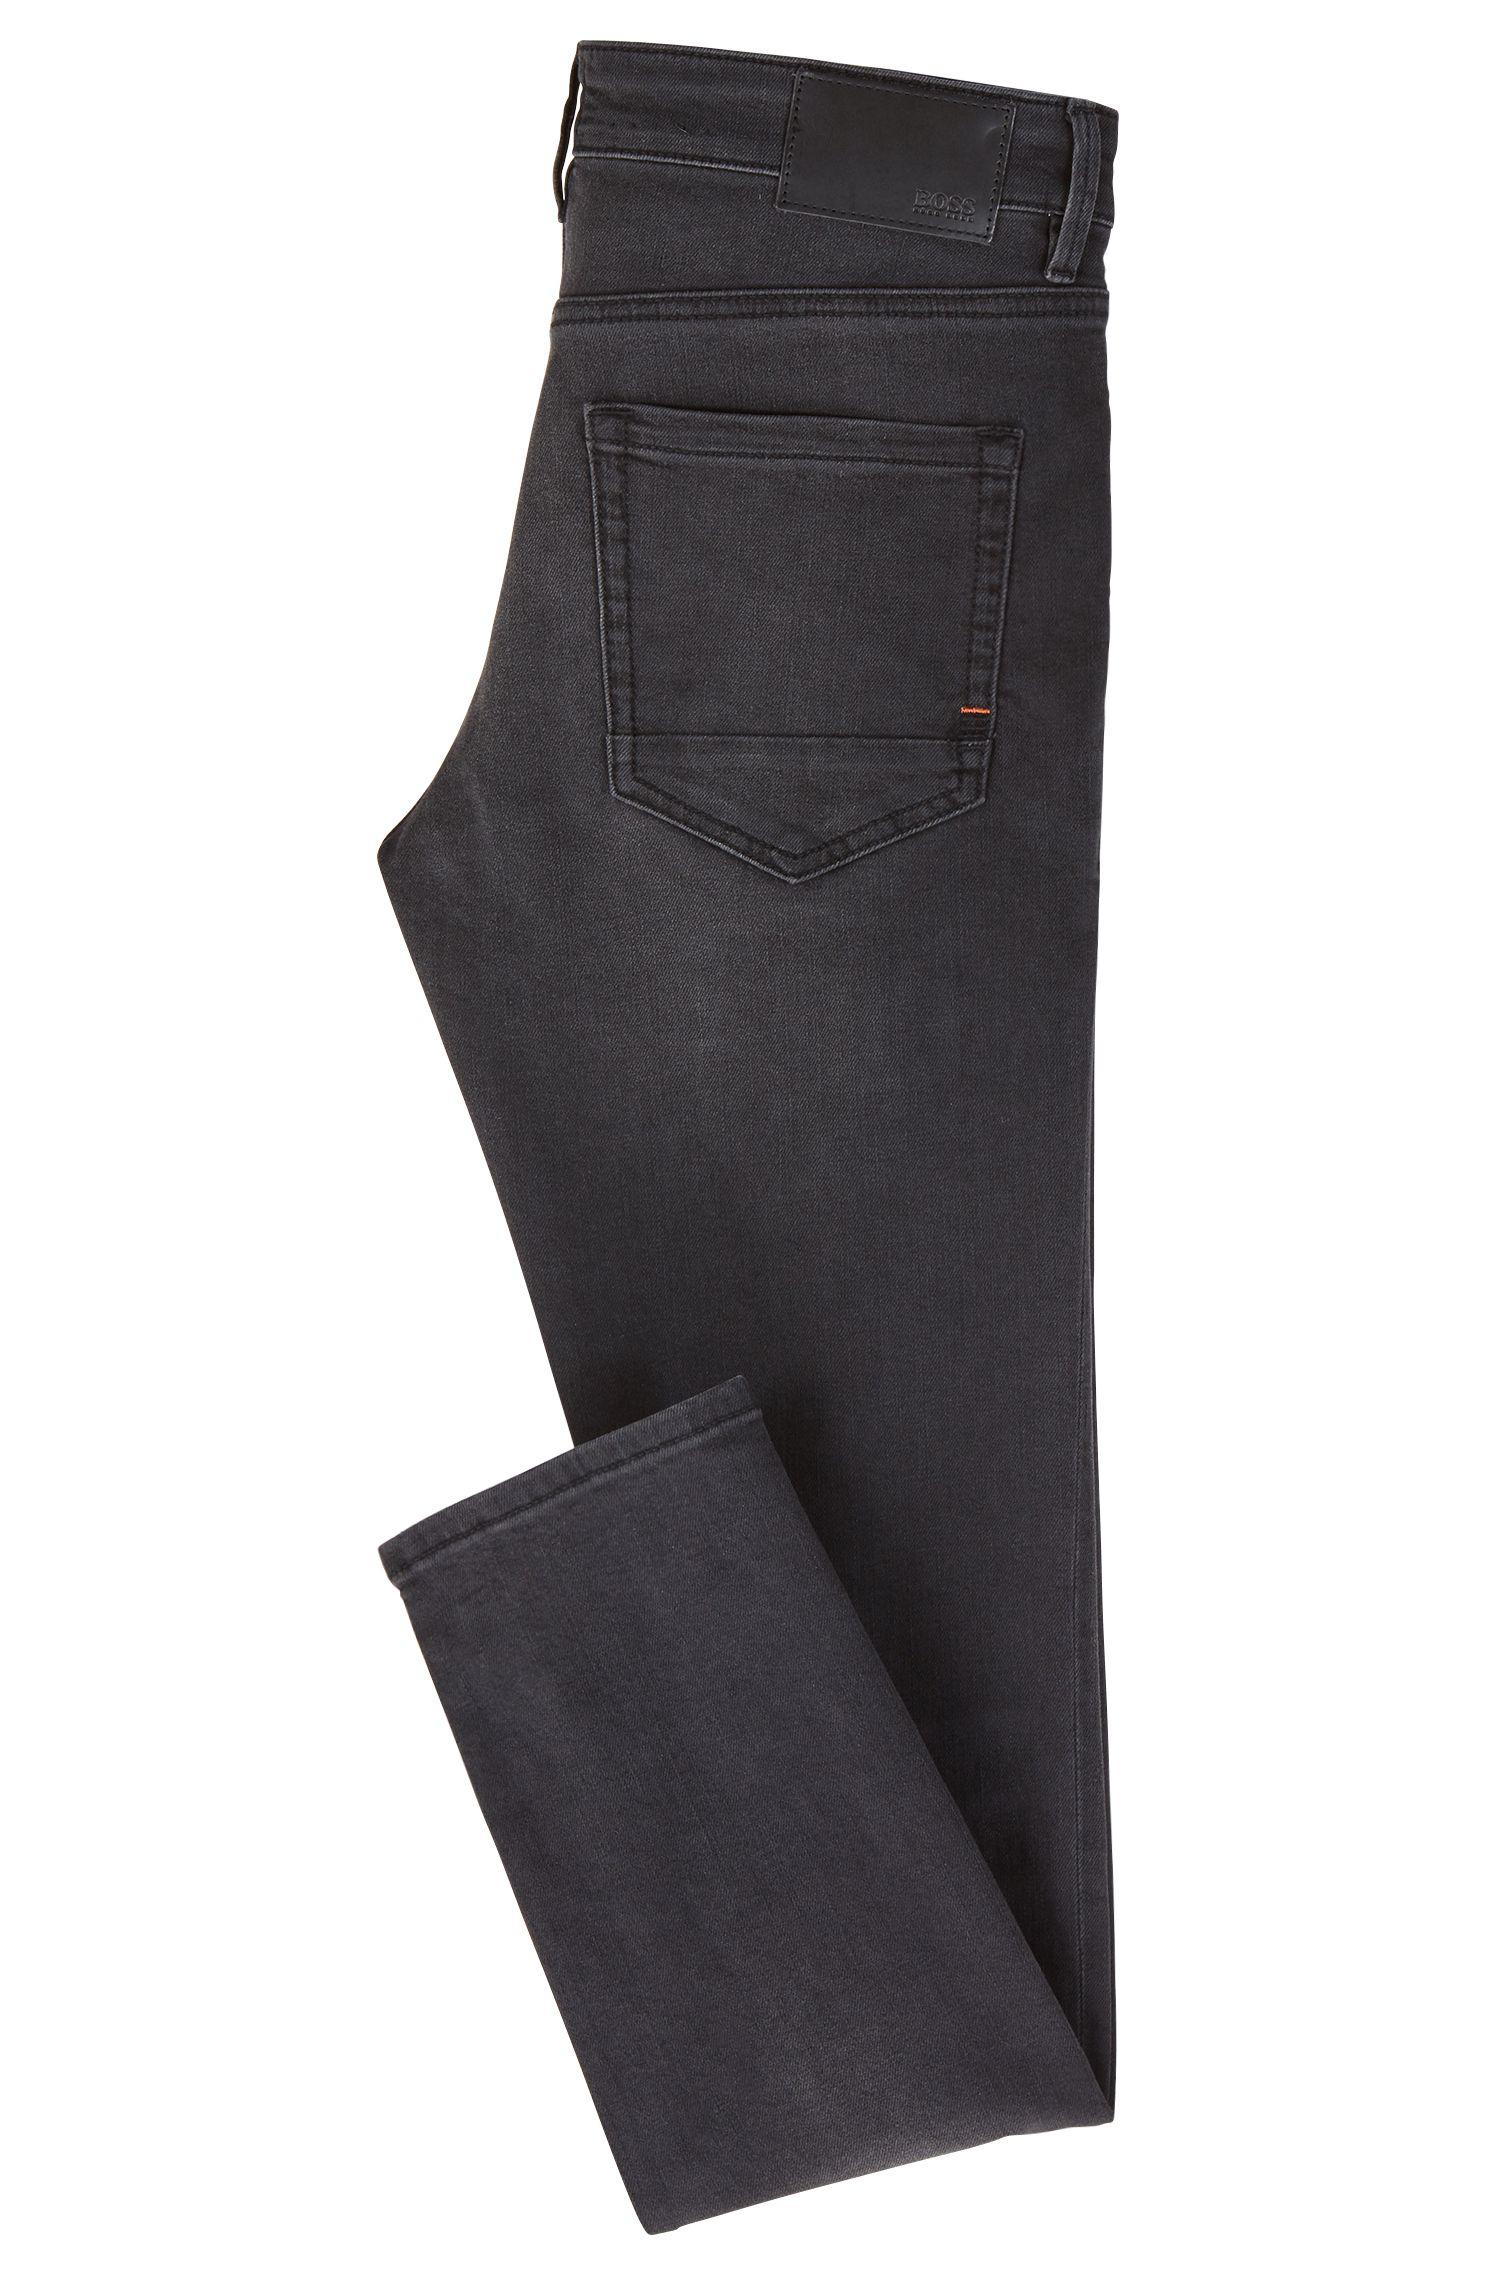 Skinny-fit jeans in super-stretch washed denim, Black